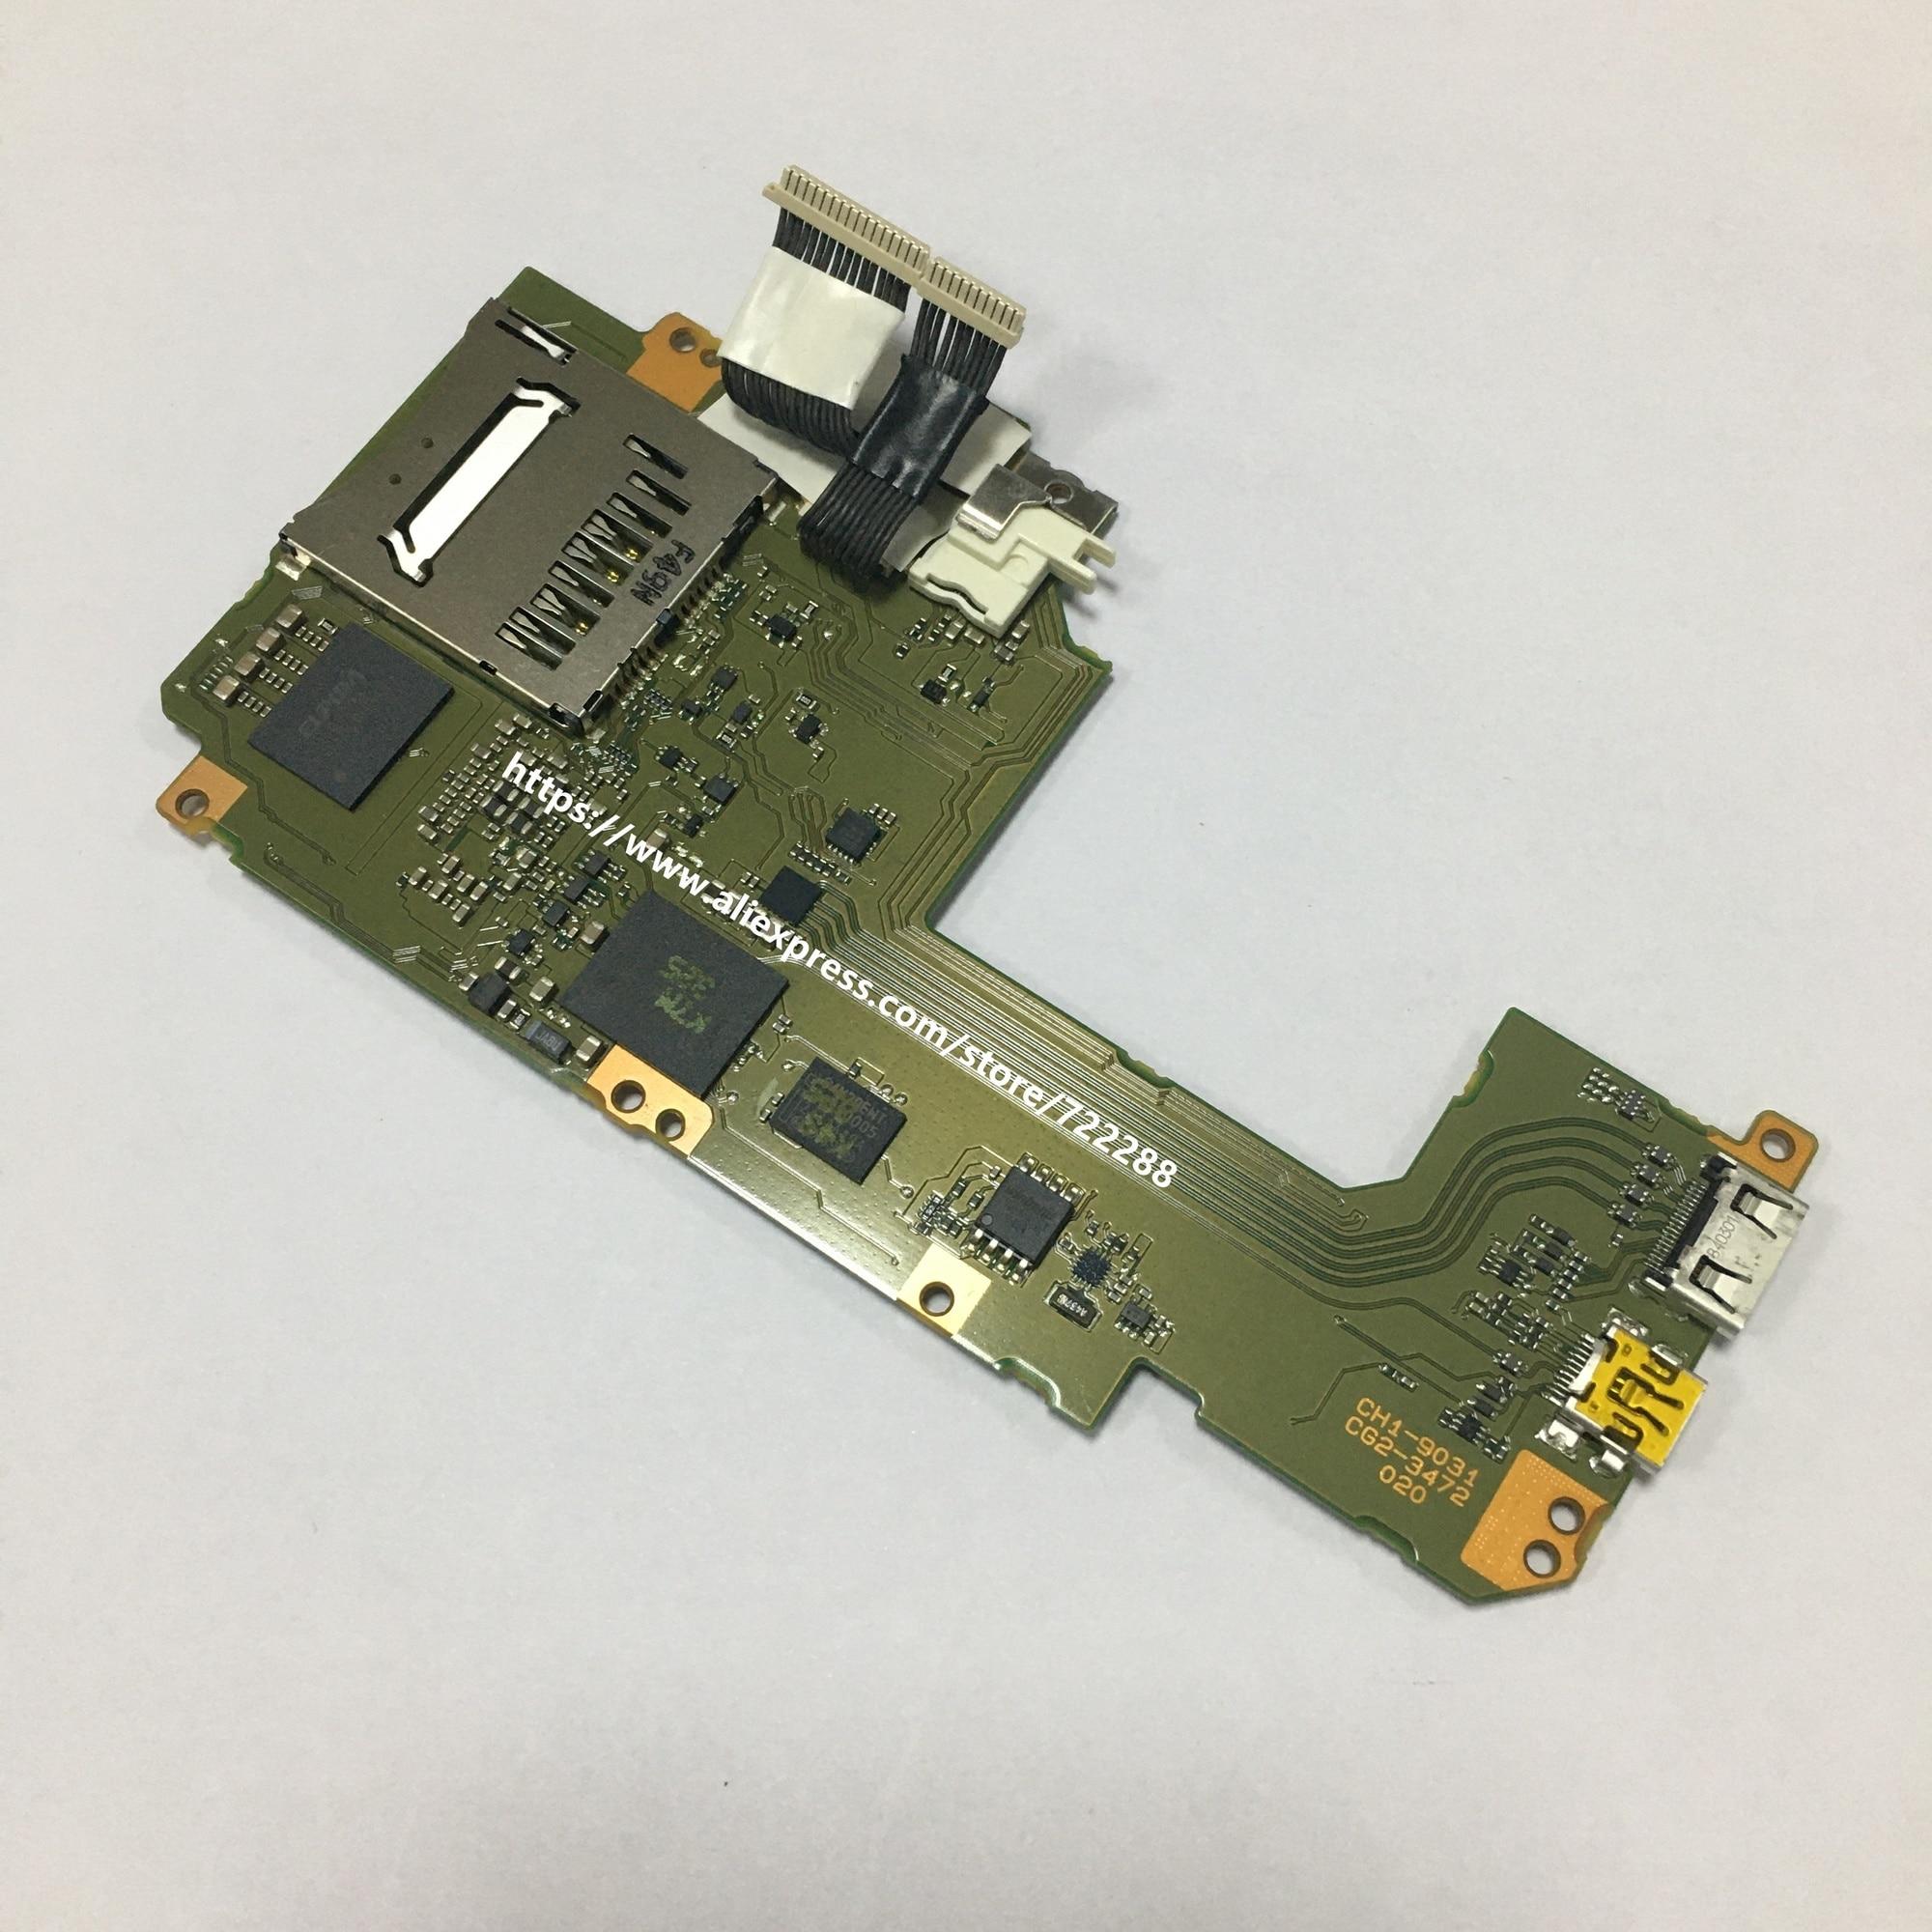 Repair Parts For Canon EOS 70D Main Board MCU Motherboard PCB Assy Card Slot New Original CG2-3390-000 enlarge